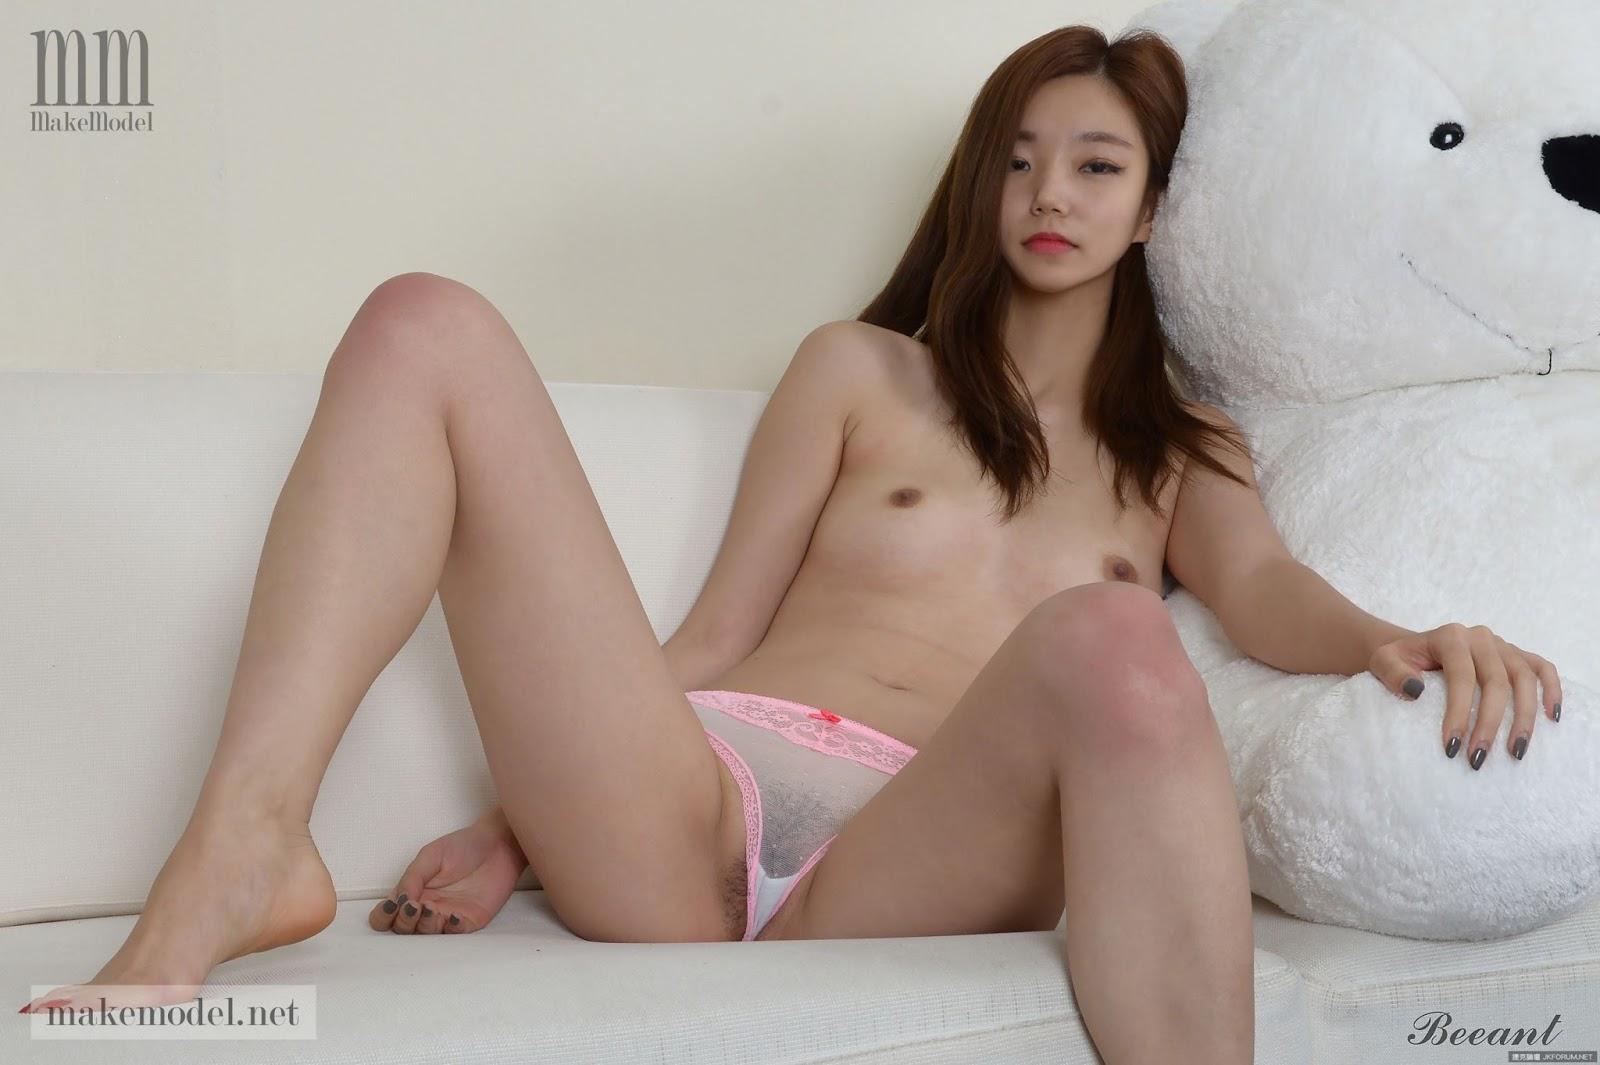 270912 3466 - Korean Nude - Big Albom Remain #A-korean girl